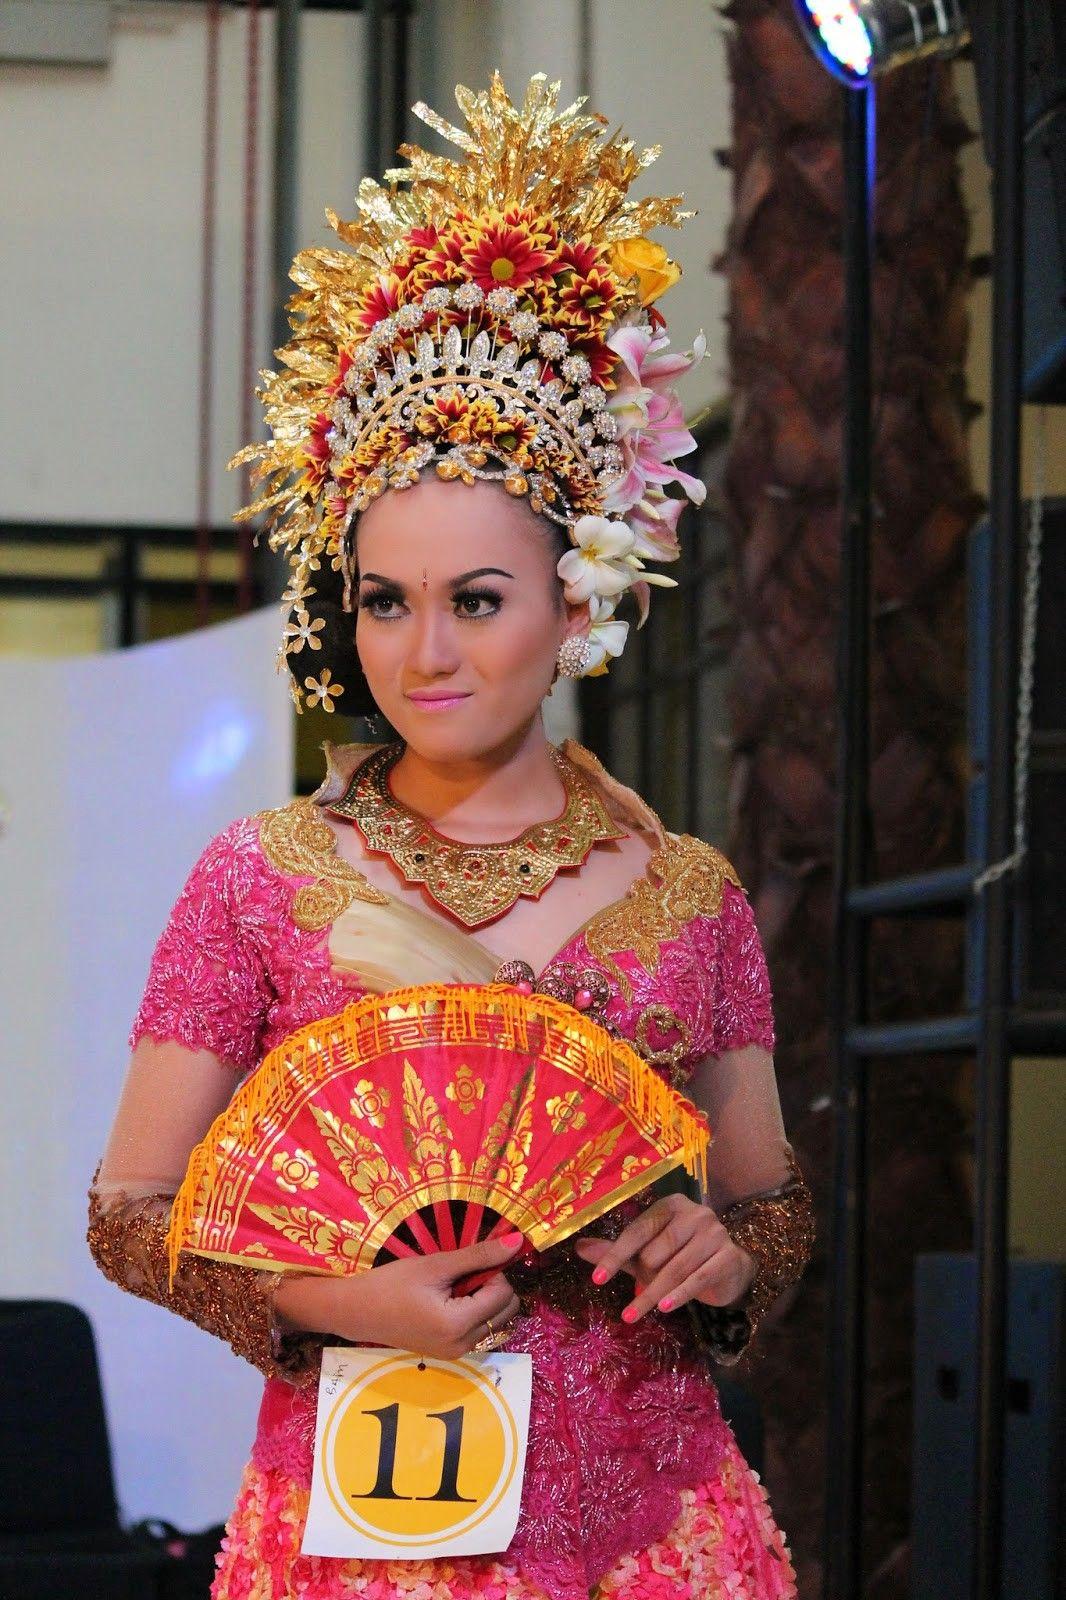 Gambar Pakaian Adat Bali Wanita